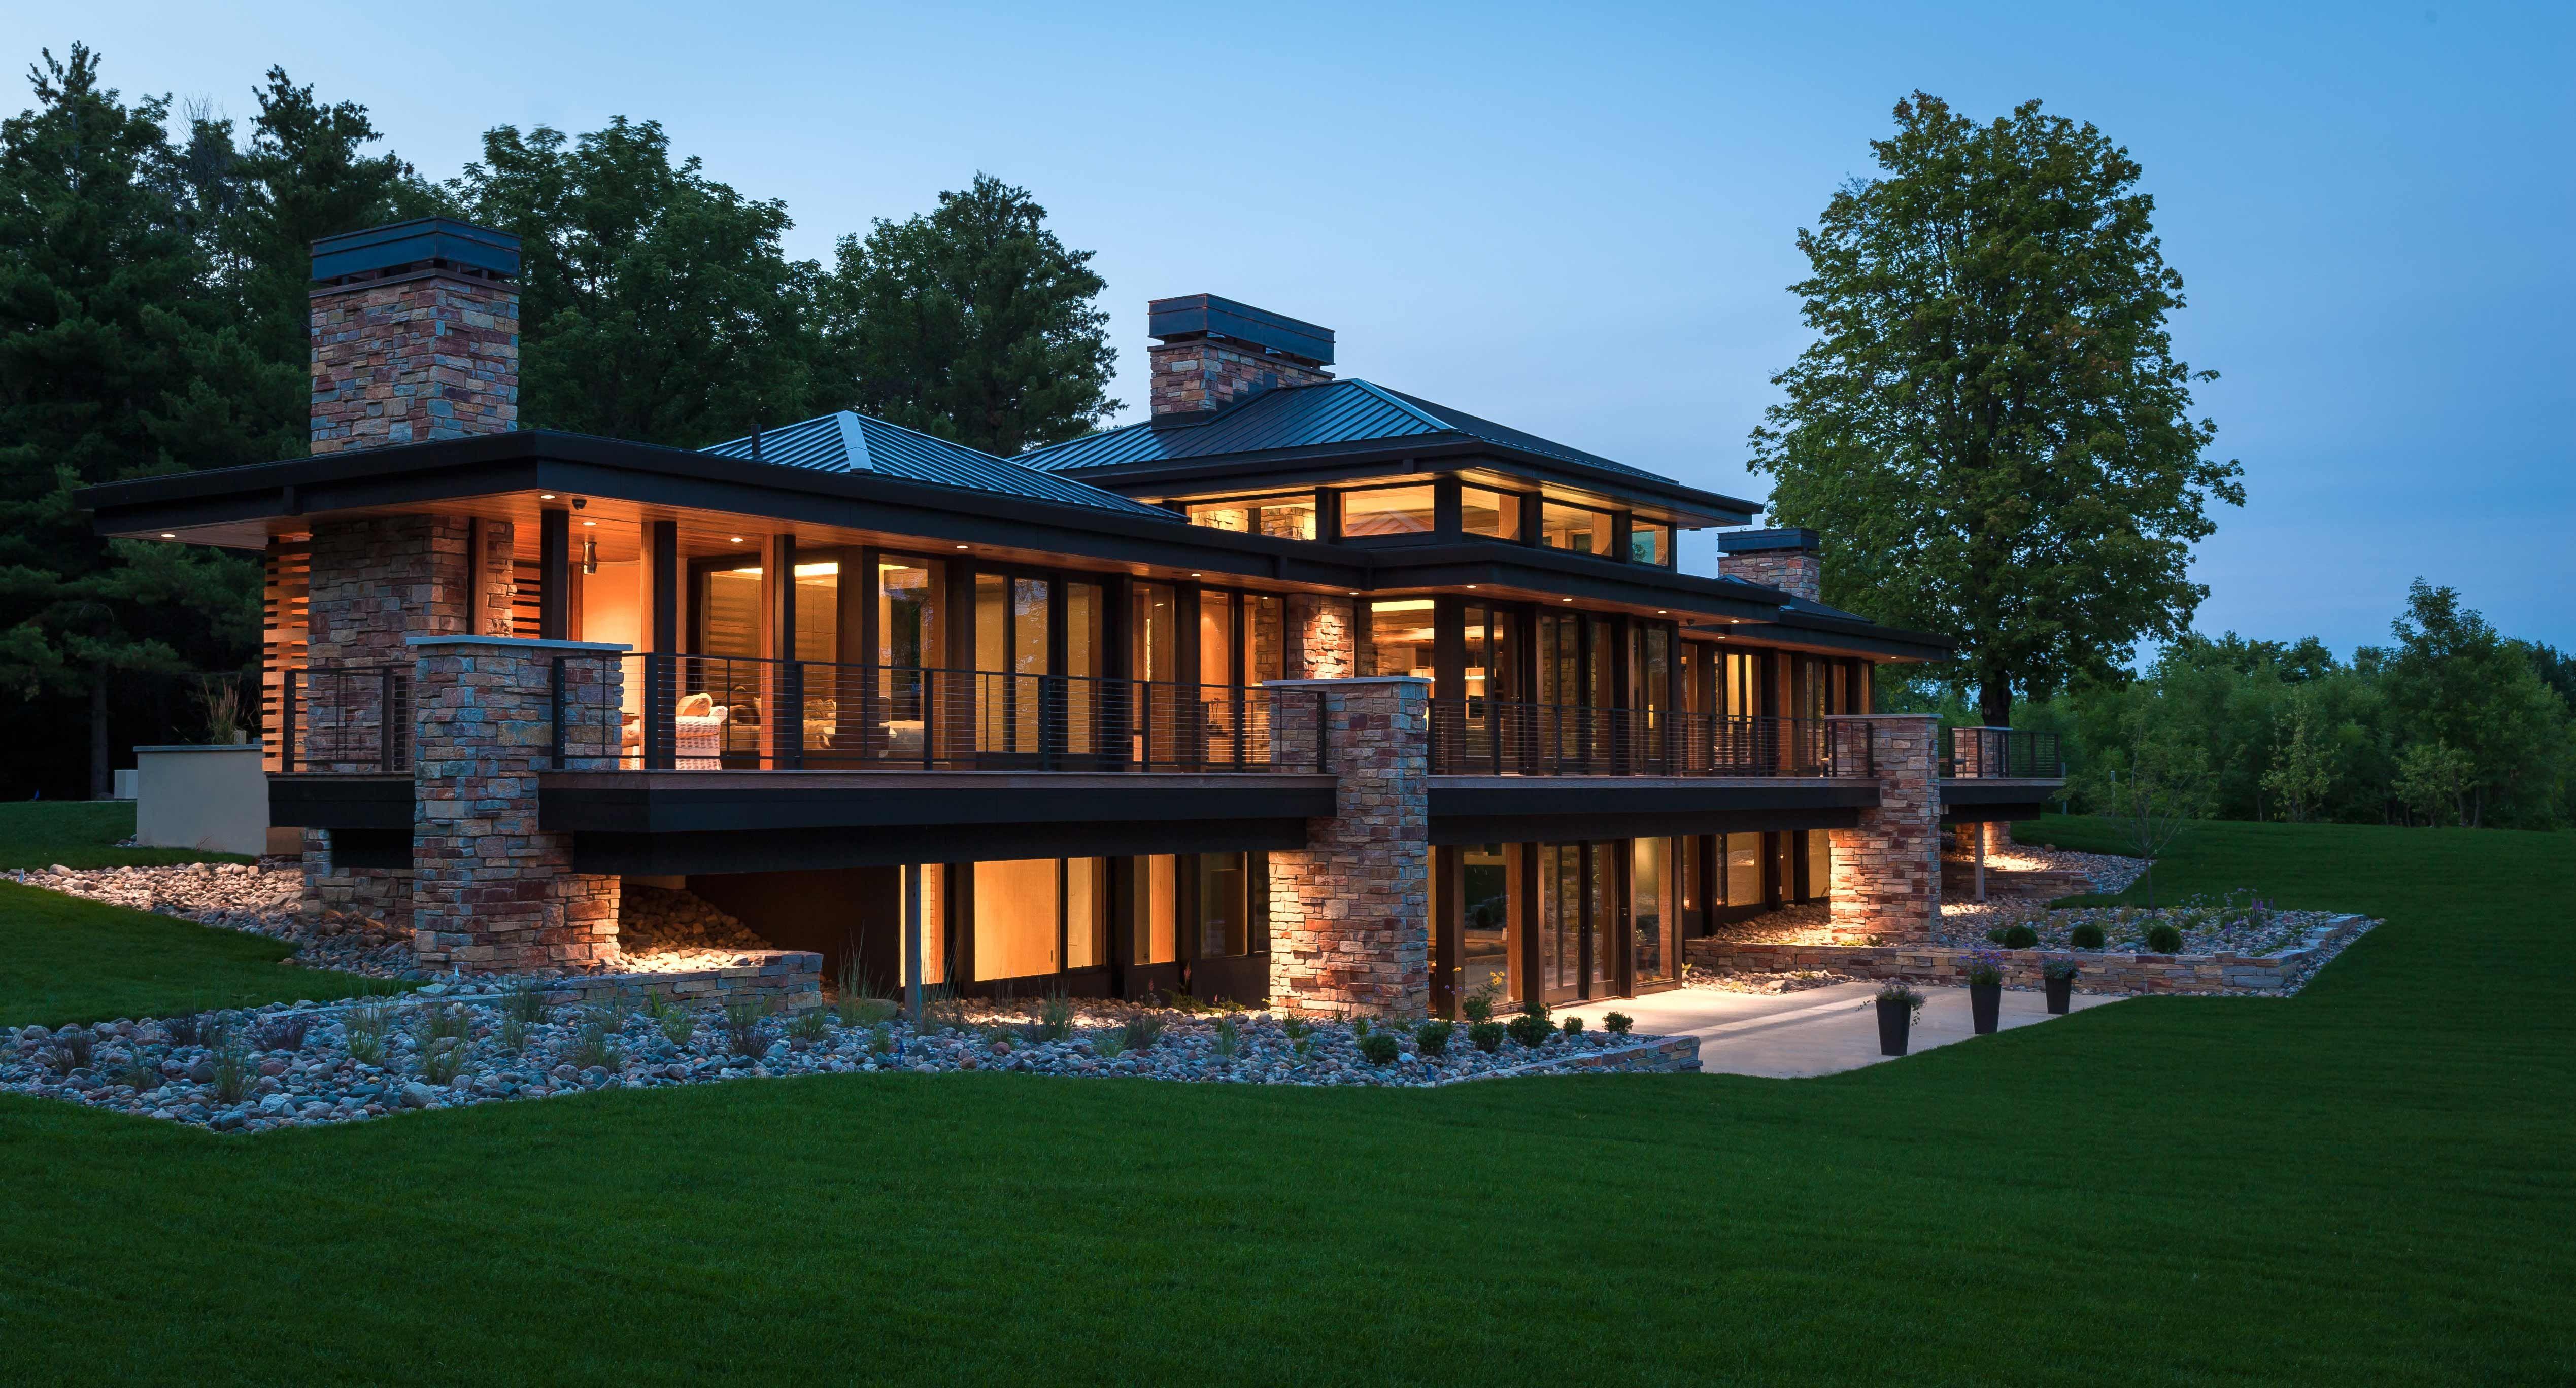 MODERN LAKE HOME  CHARLES R STINSON ARCHITECTURE